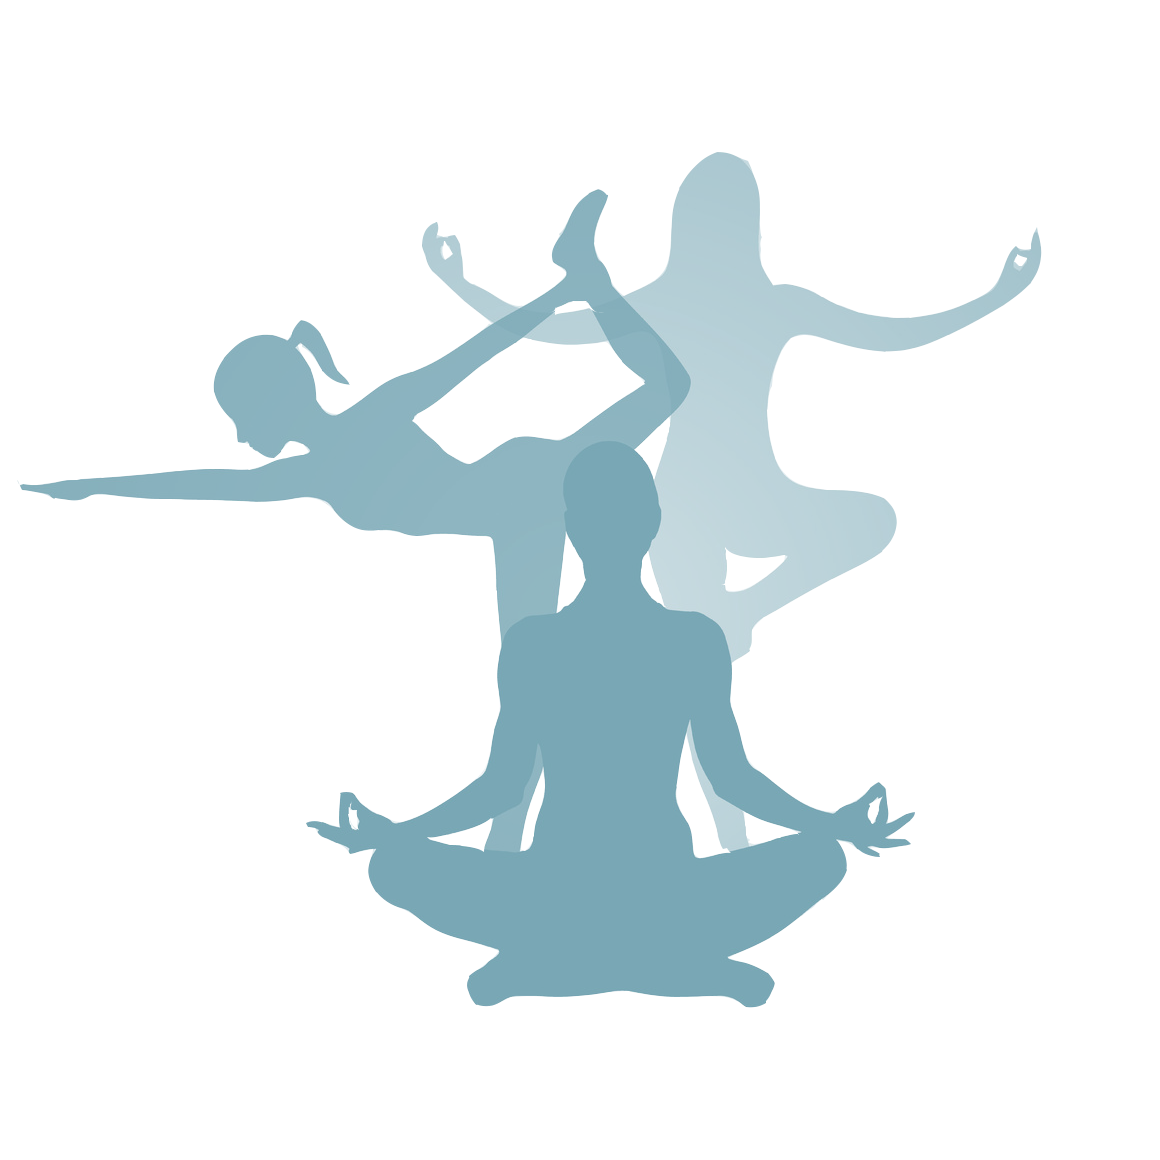 Free PNG Yoga - 40373